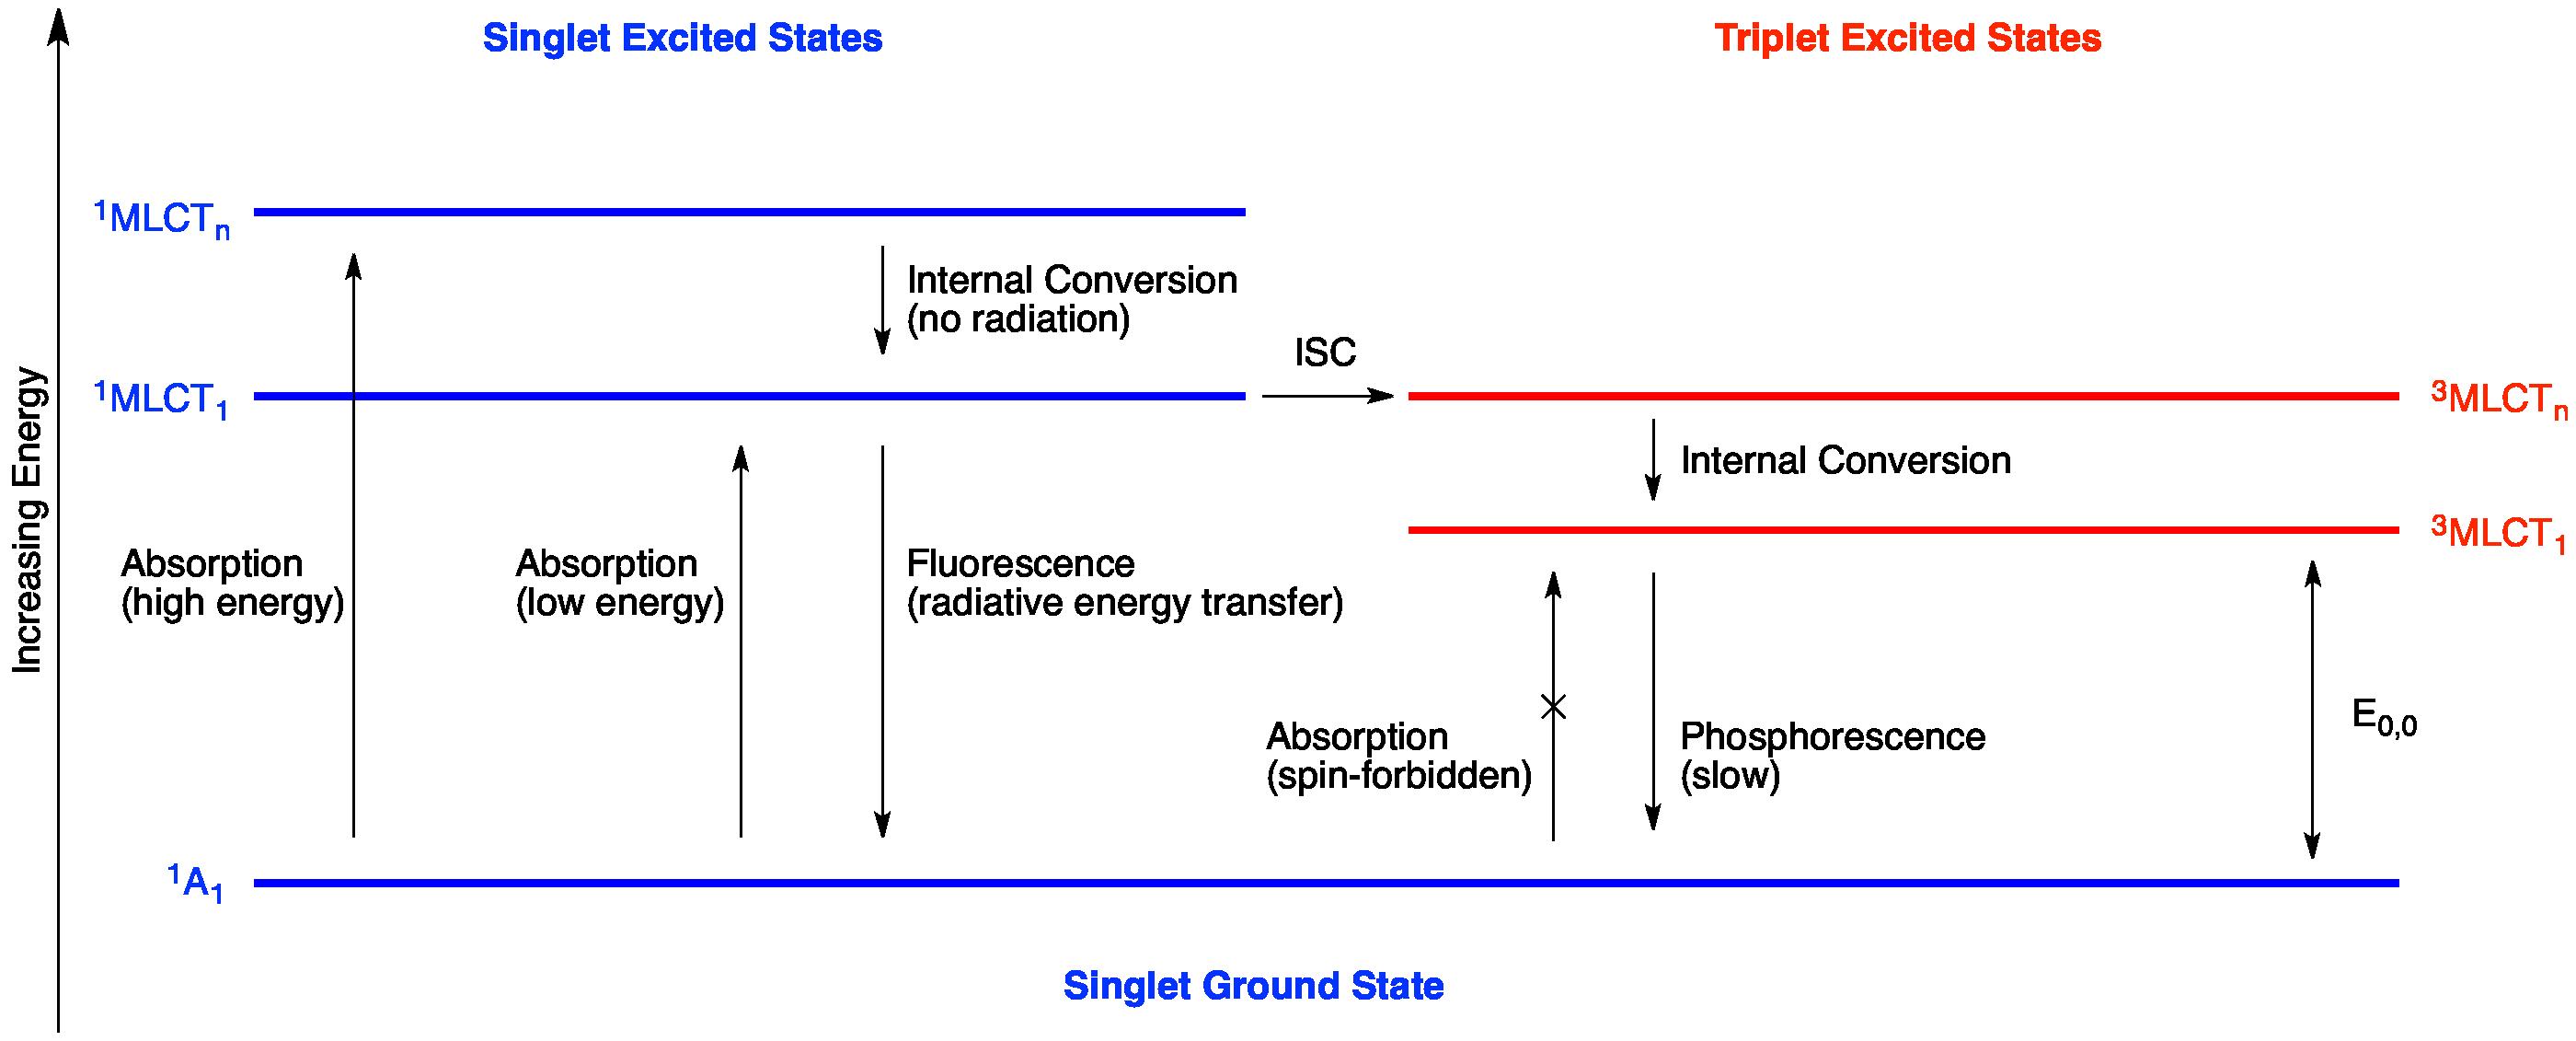 Filejablonski diagramg wikimedia commons filejablonski diagramg ccuart Images